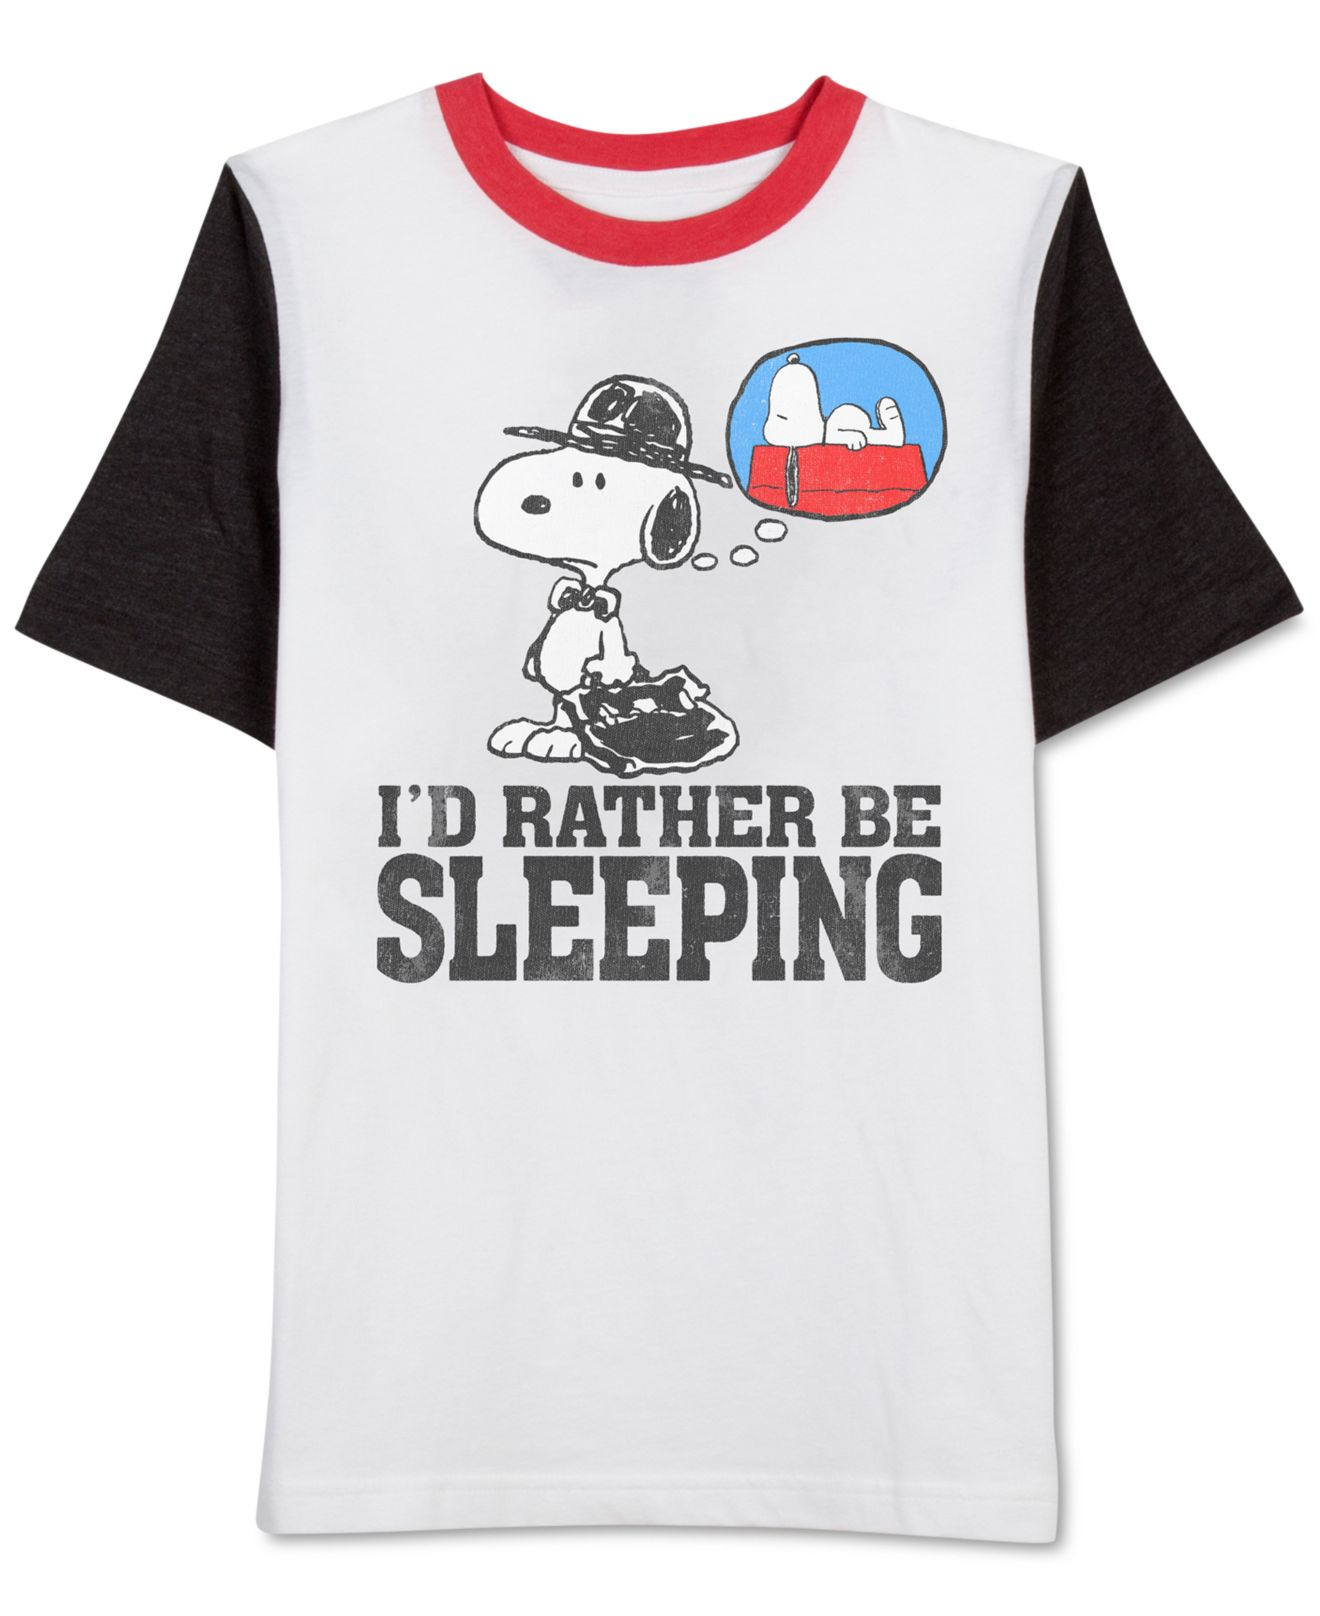 ca59f989f Jem Men's Peanuts Sleeping Snoopy T-shirt in Black for Men - Lyst